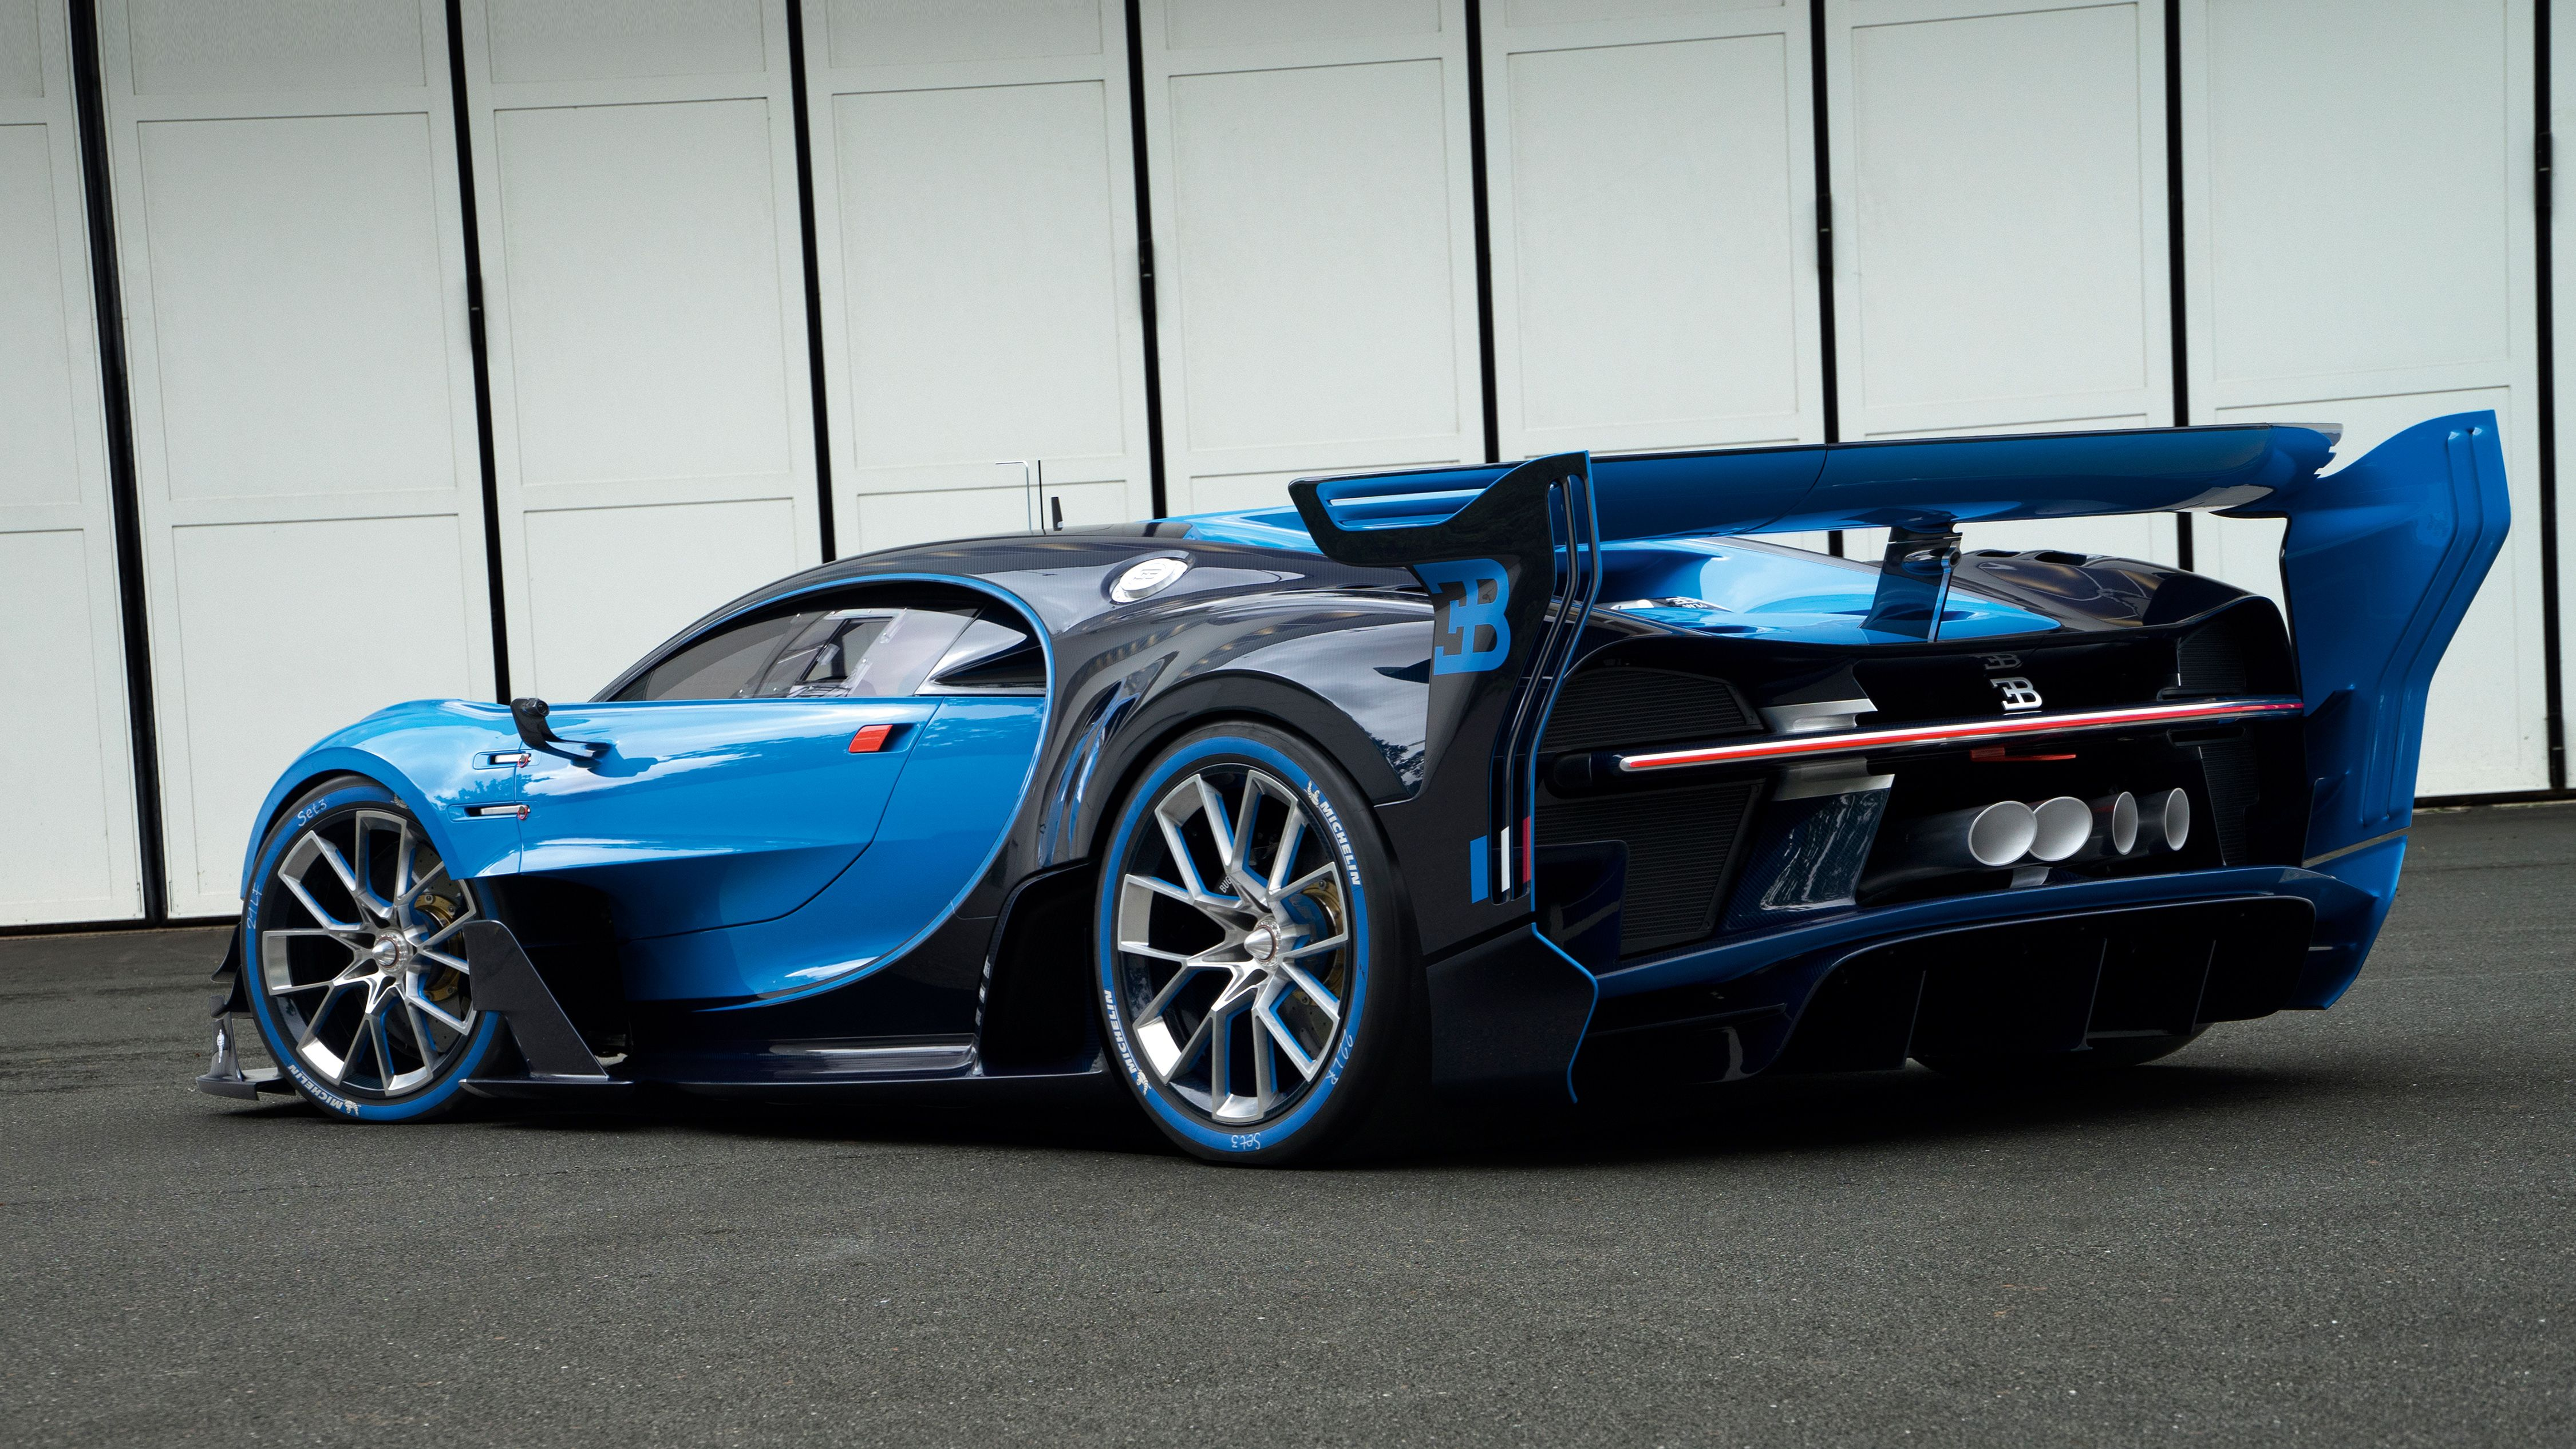 Bugatti Vision Gran Turismo 2017 Суперкары, Автомобили